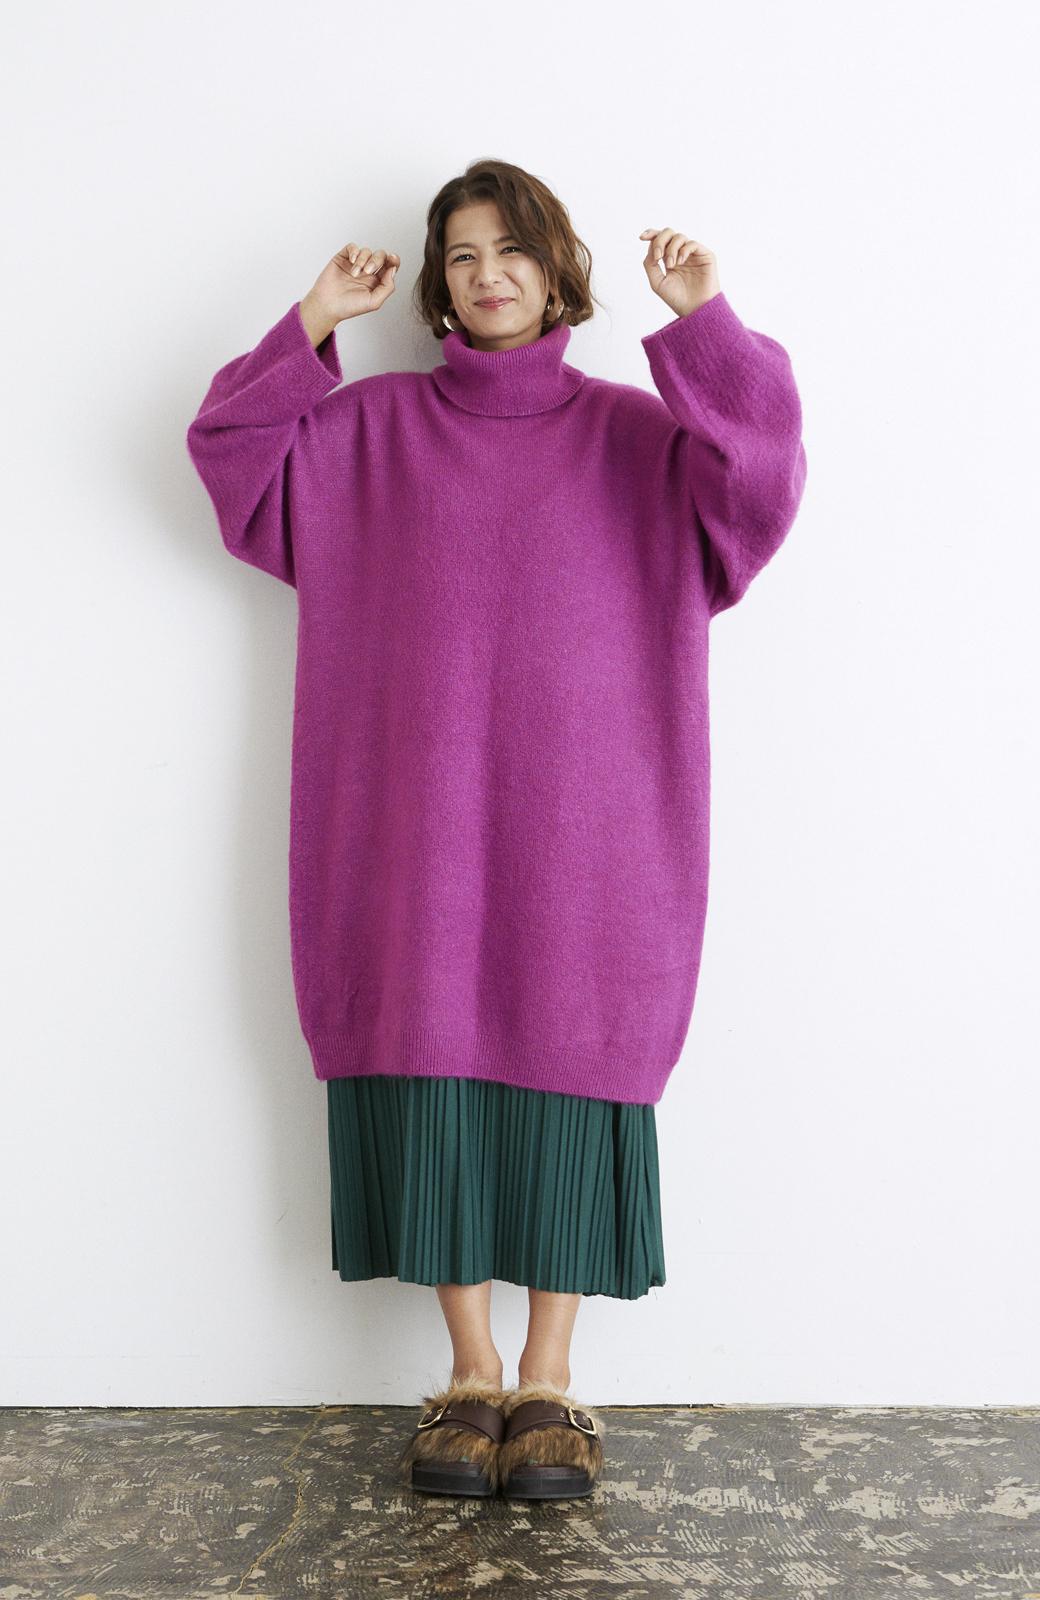 haco! <スザンヌさんコラボ>ラブ&ピースプロジェクト ニットワンピ&チュール刺しゅうスカートセット <パープル系その他>の商品写真17